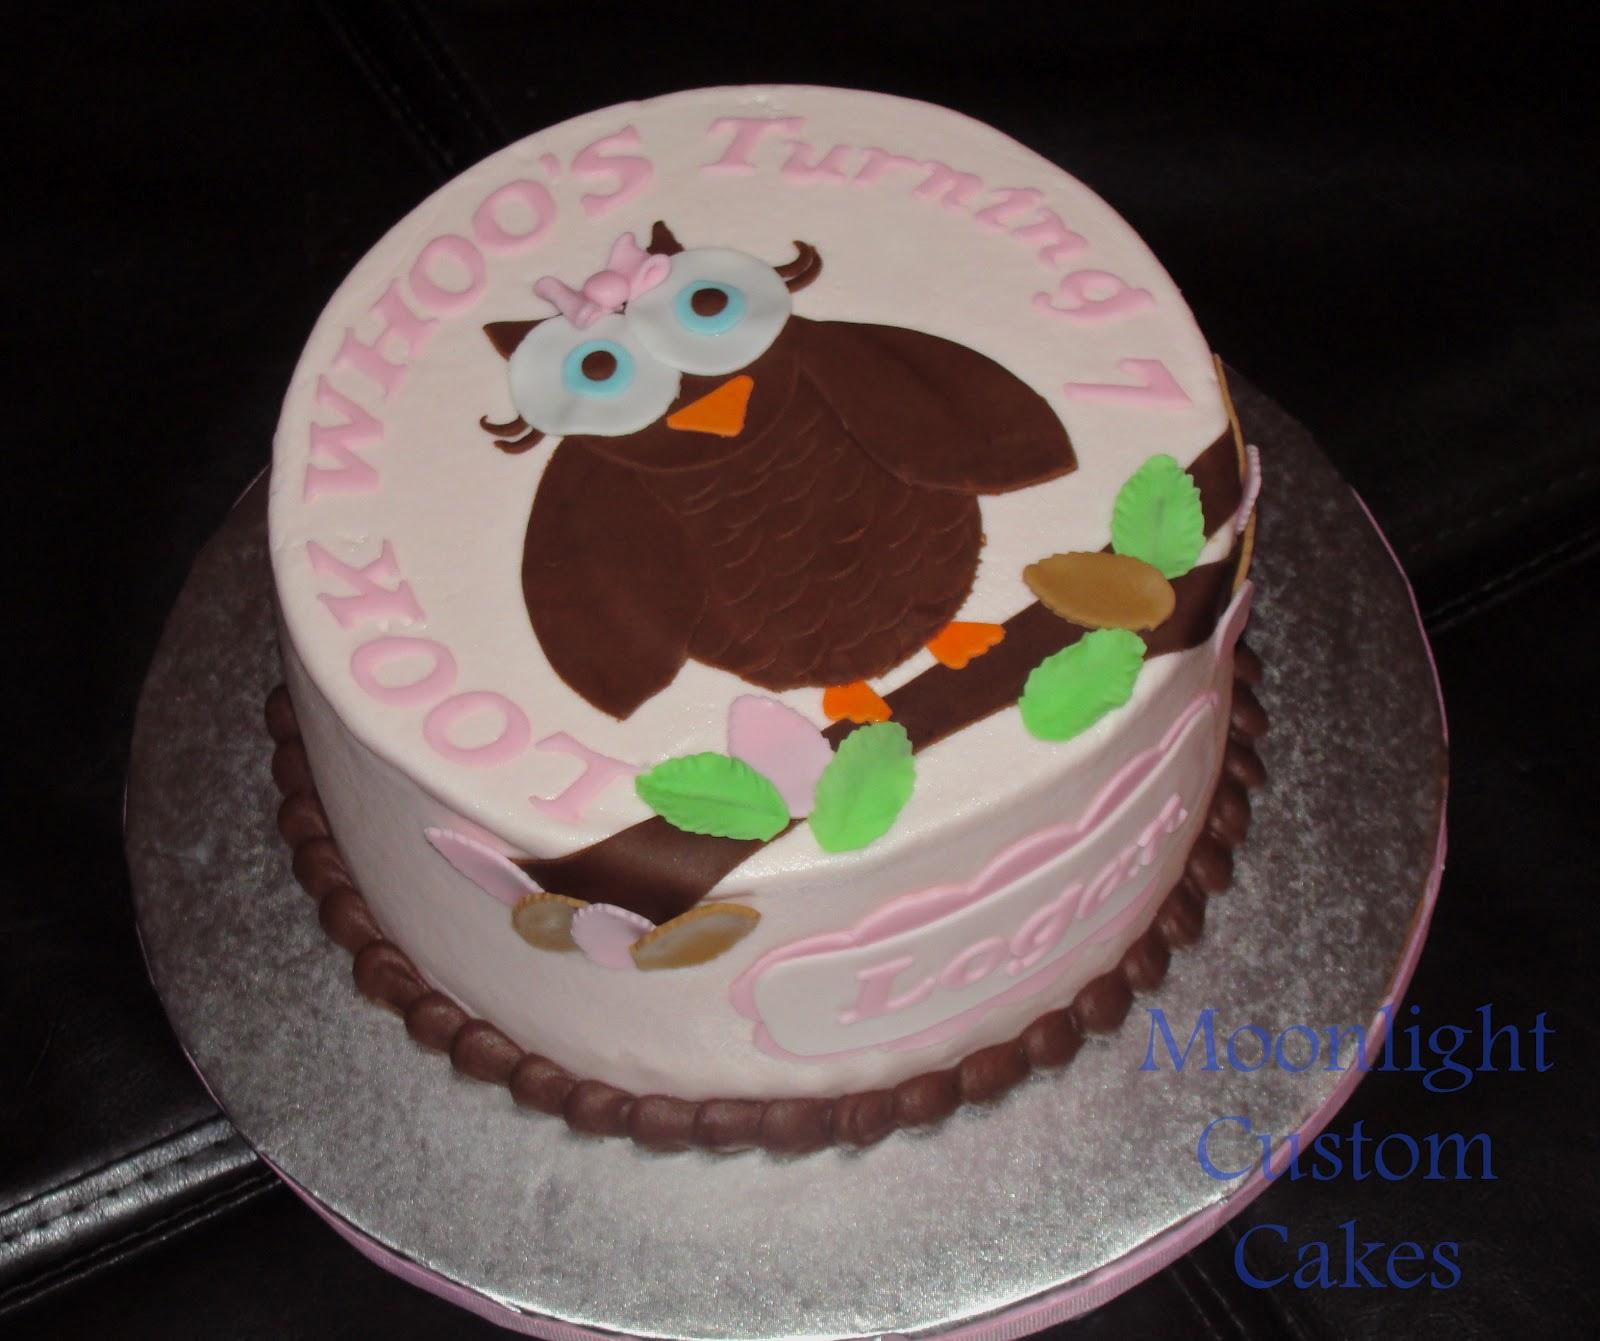 Pin Dot 13th Birthday Cake Feeds 20 25 Msrp 110 On Pinterest